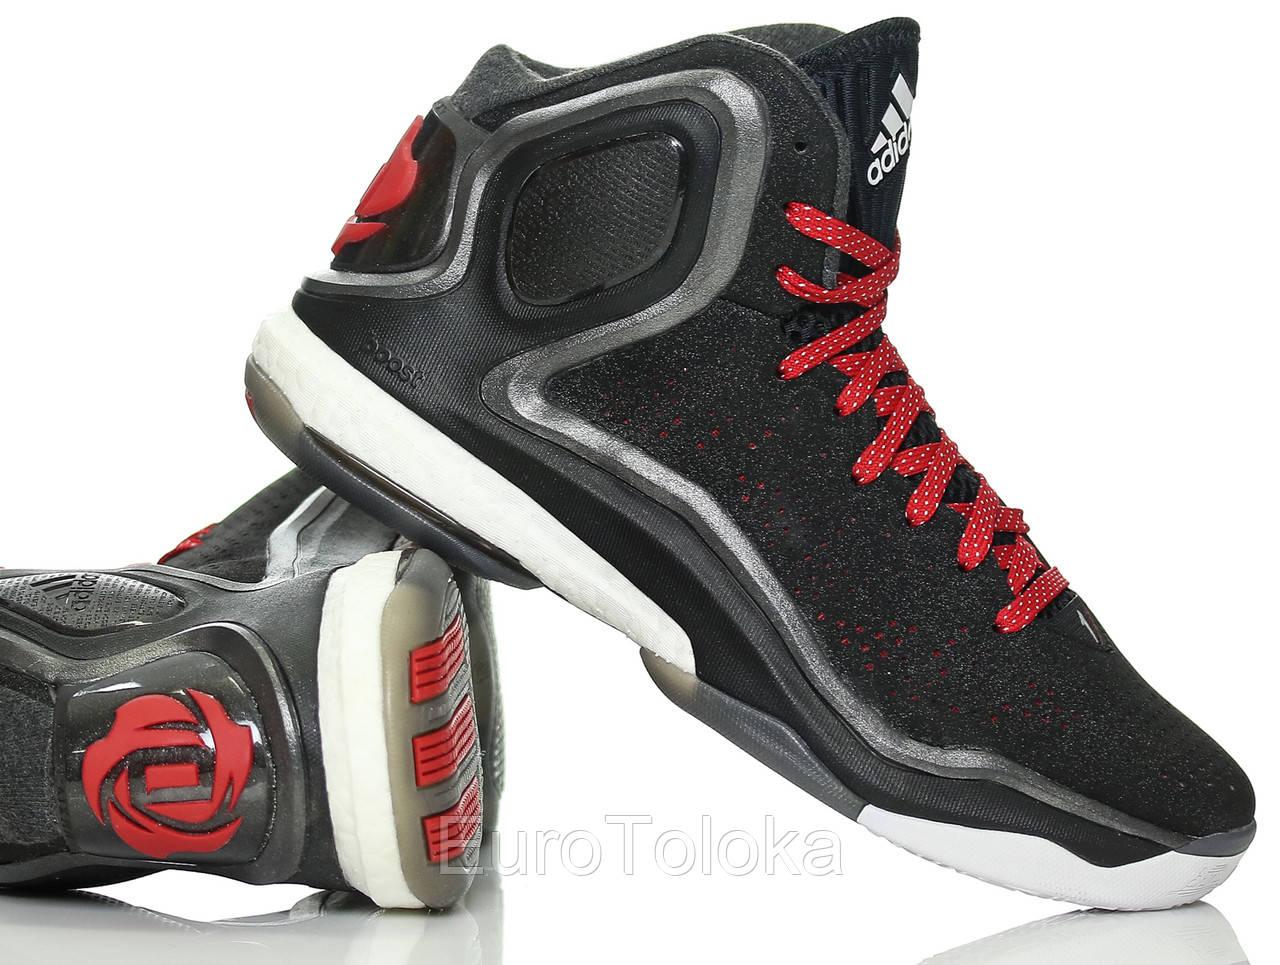 adidas d rose 5 boost g98704